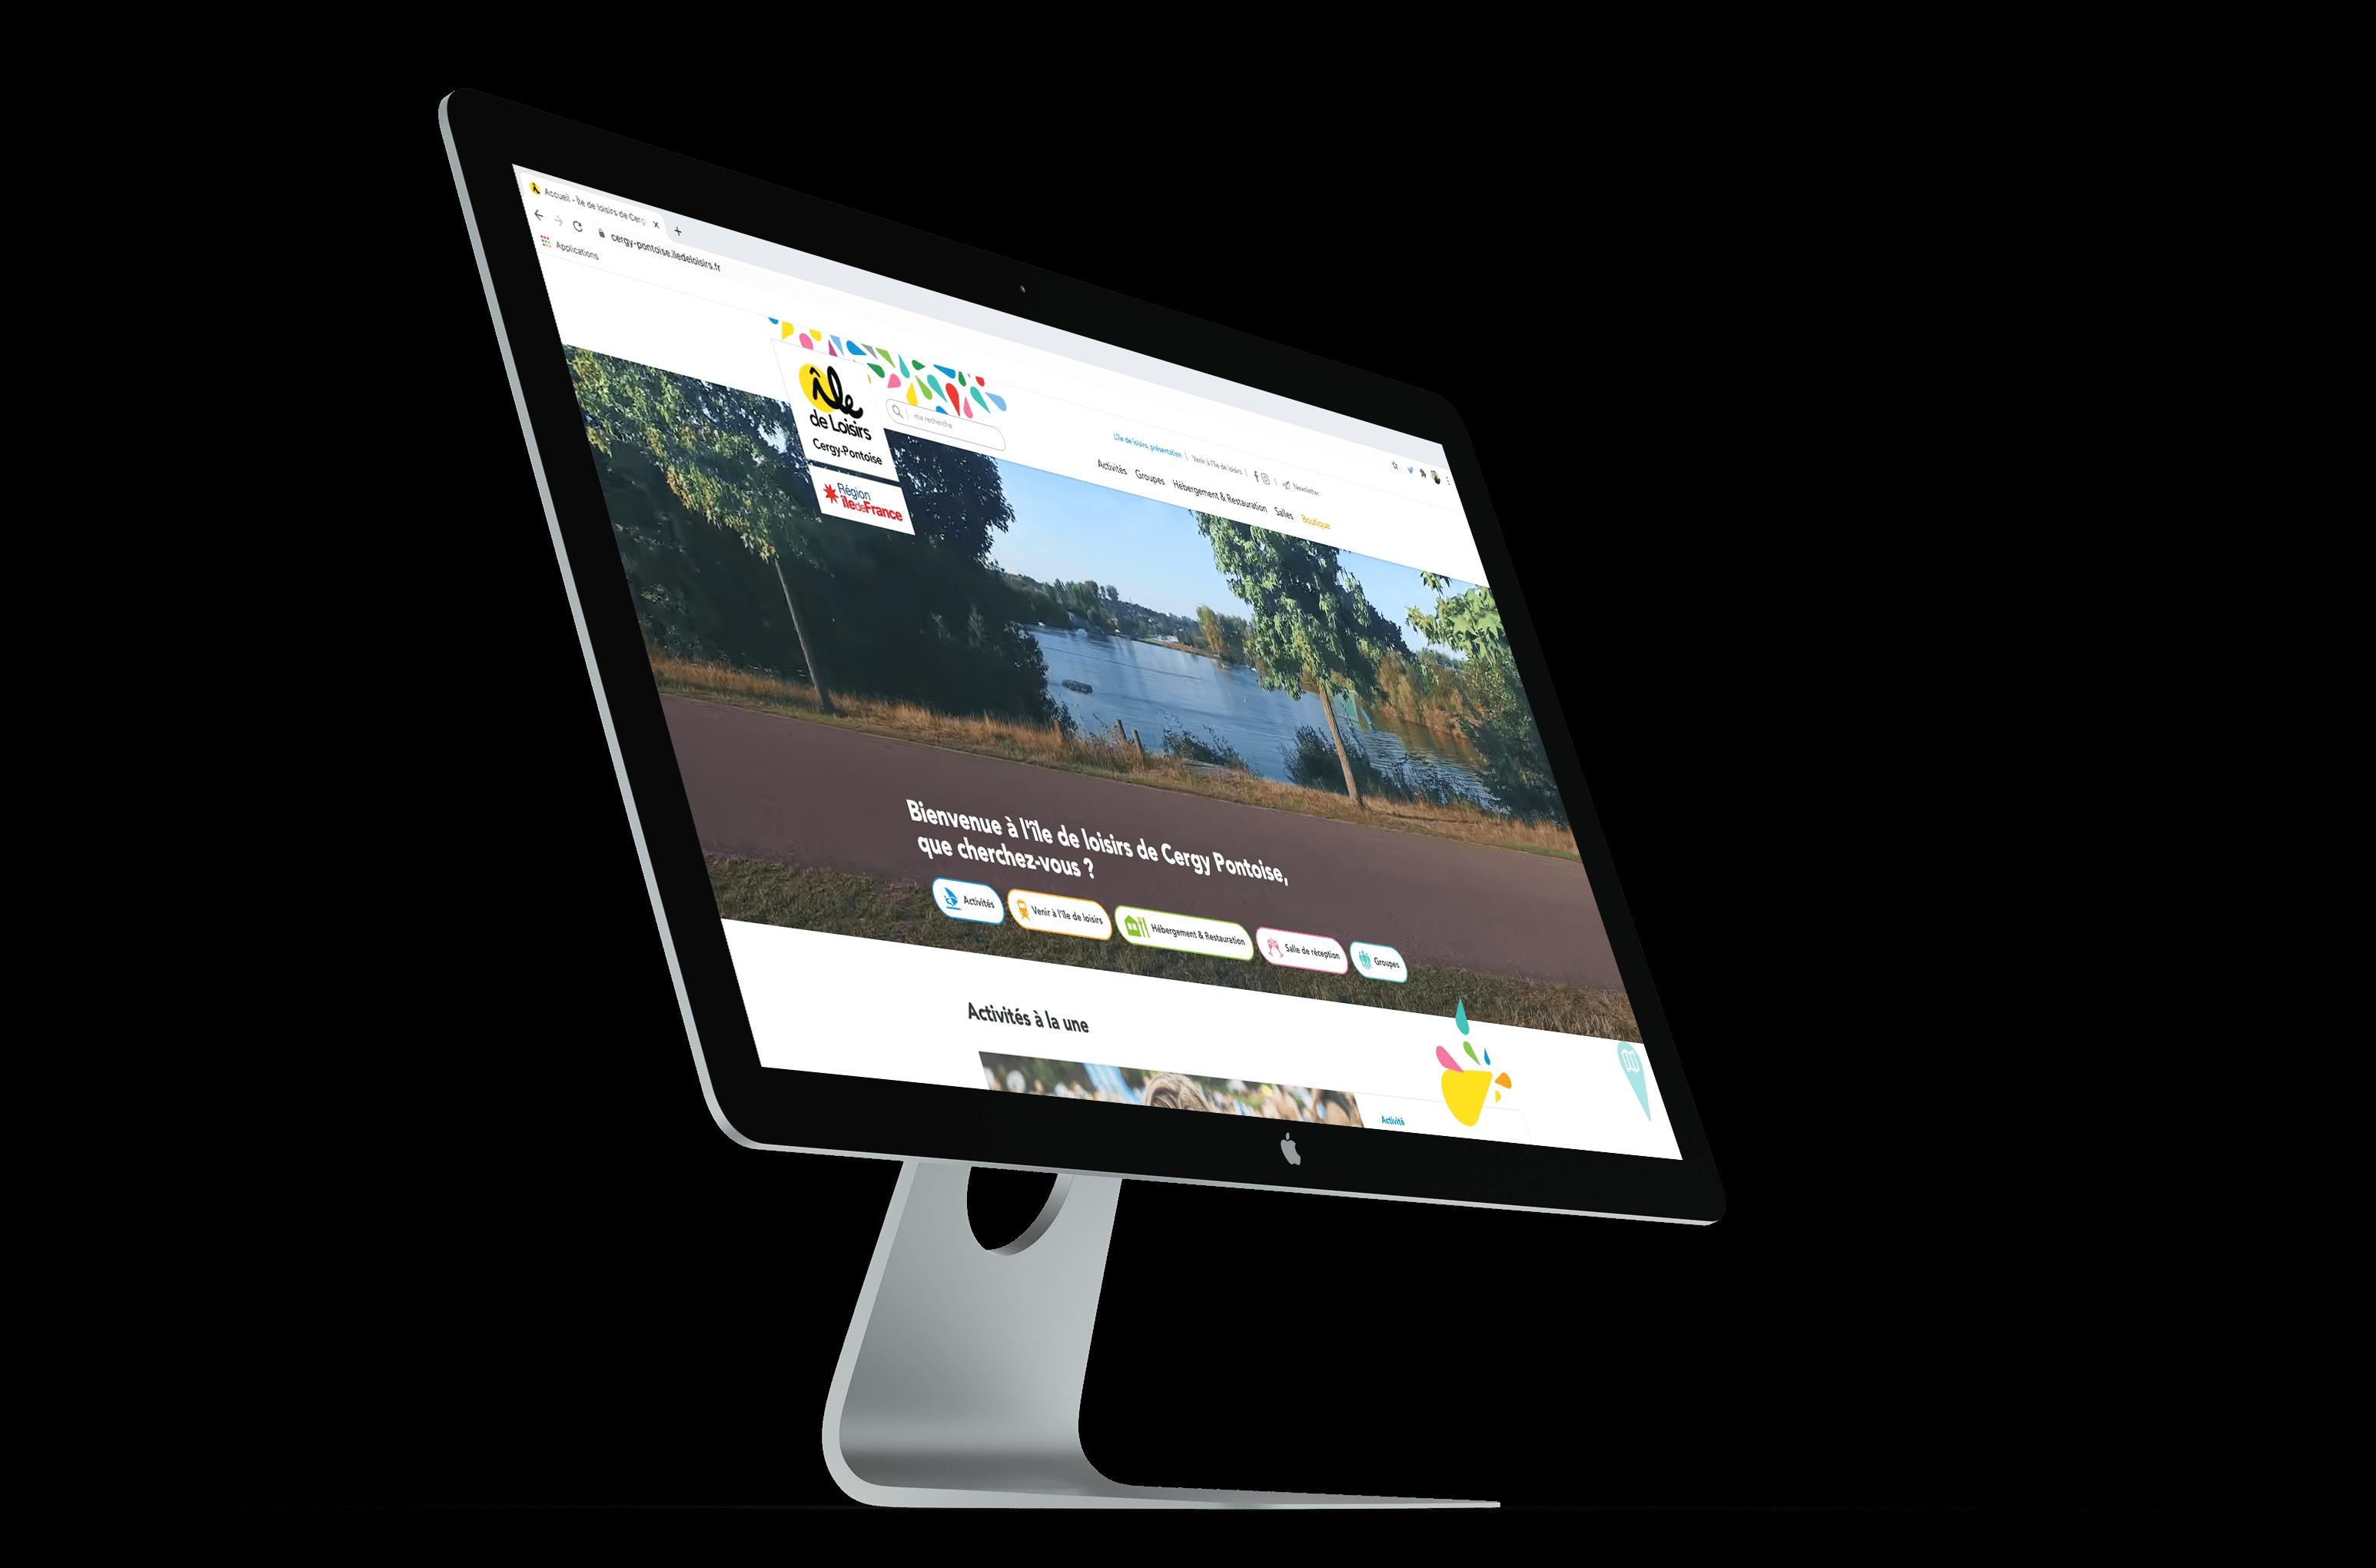 Mock-up iMac de la stratégie social media de la Base de loisirs de Cergy